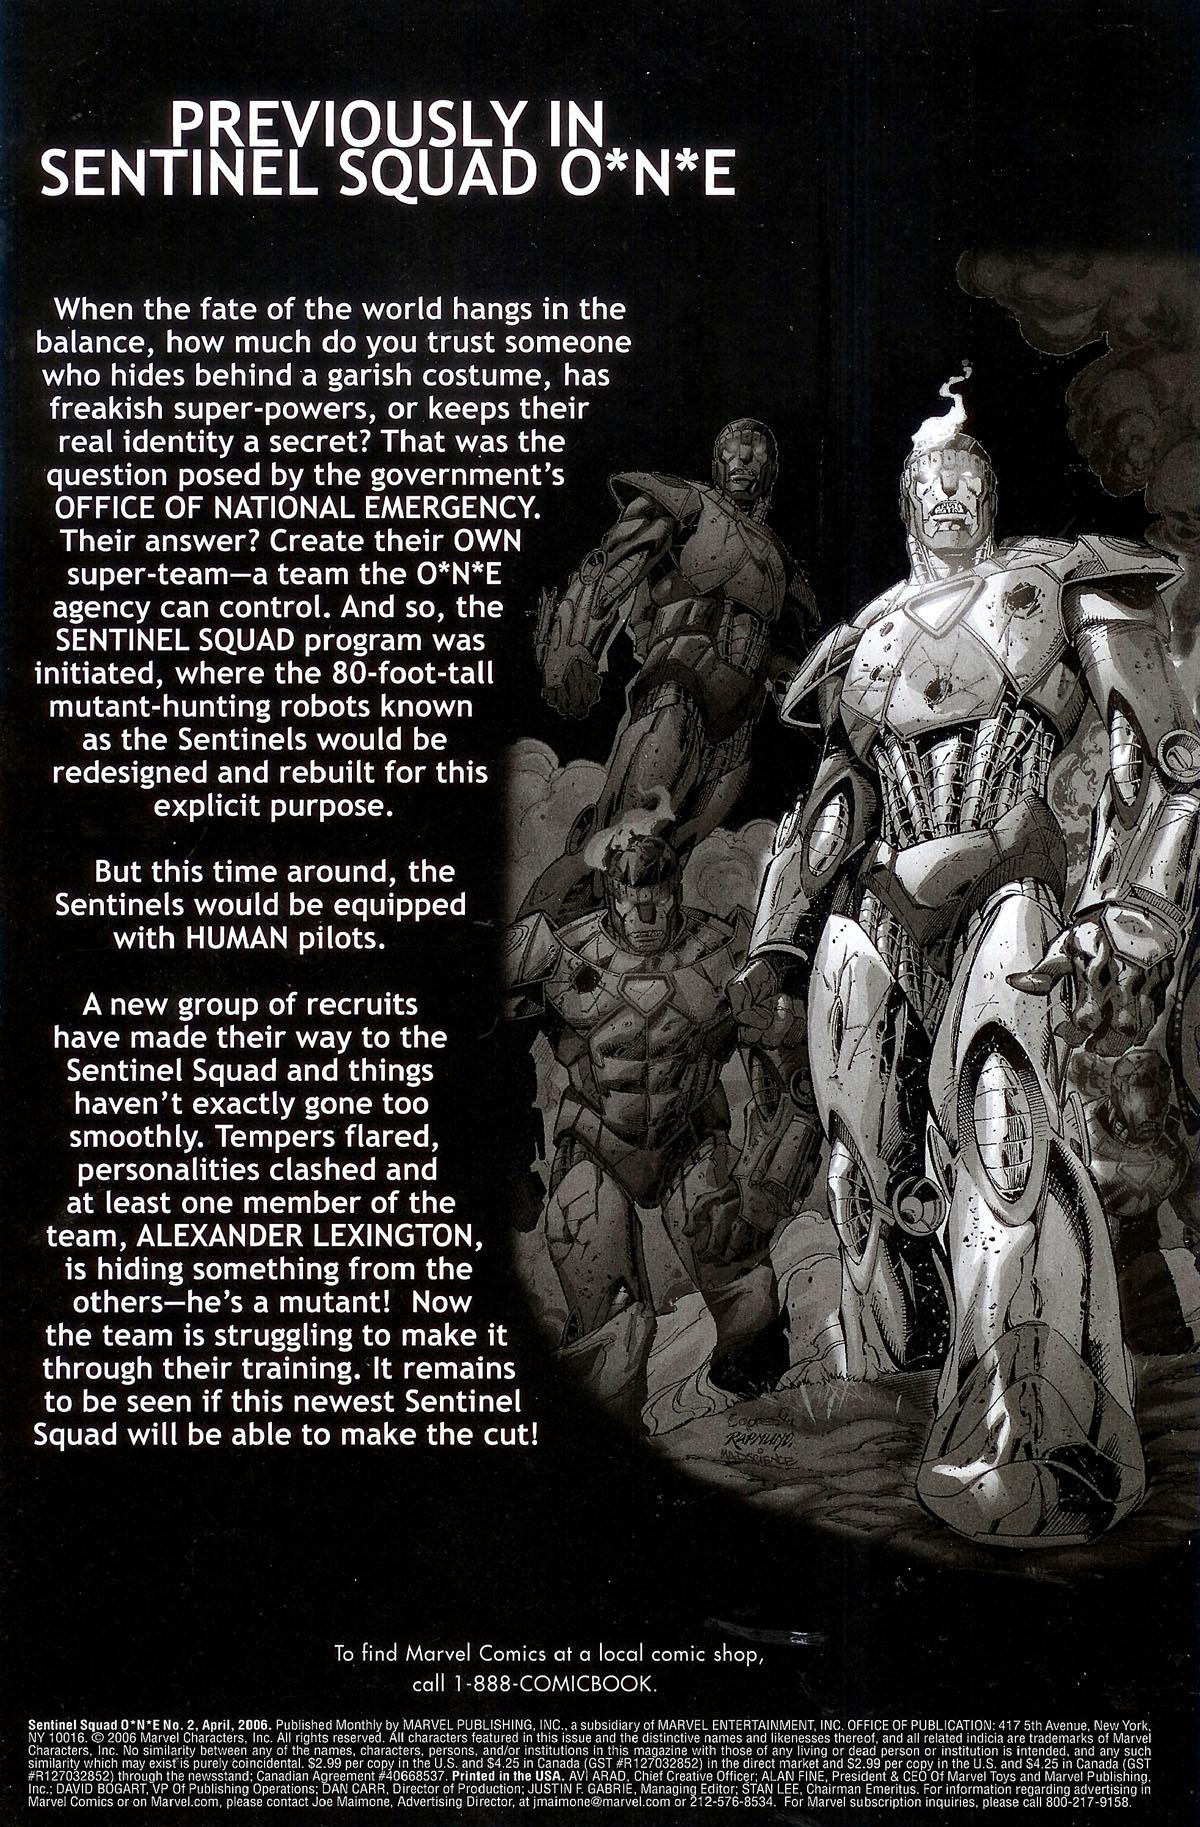 Read online Sentinel Squad O*N*E comic -  Issue #2 - 2